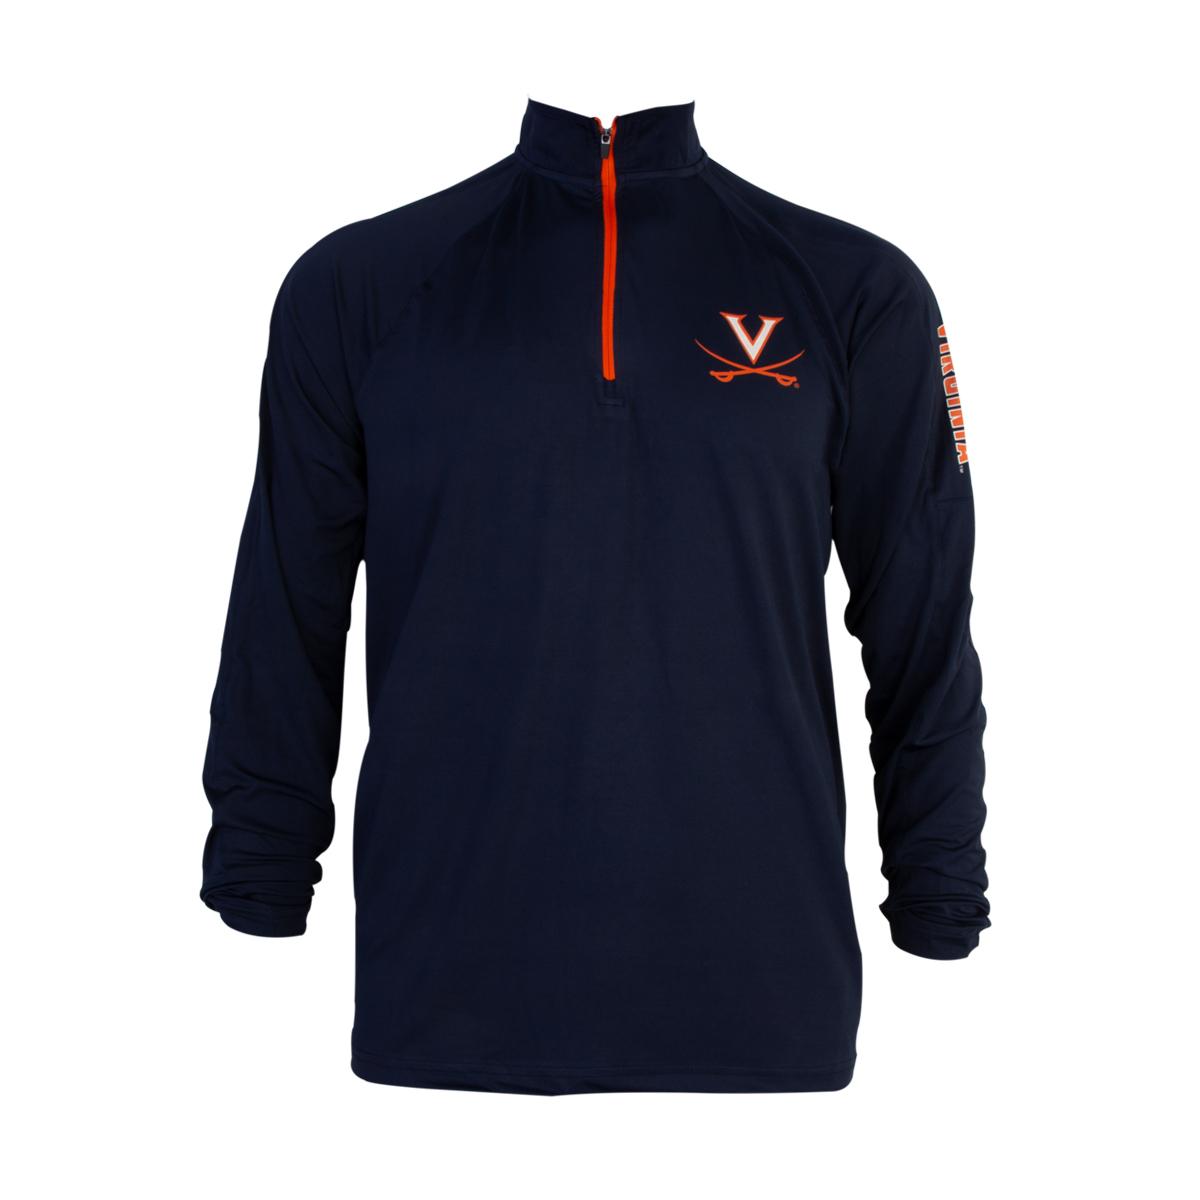 University of Virginia Quarter-Zip Navy Pullover